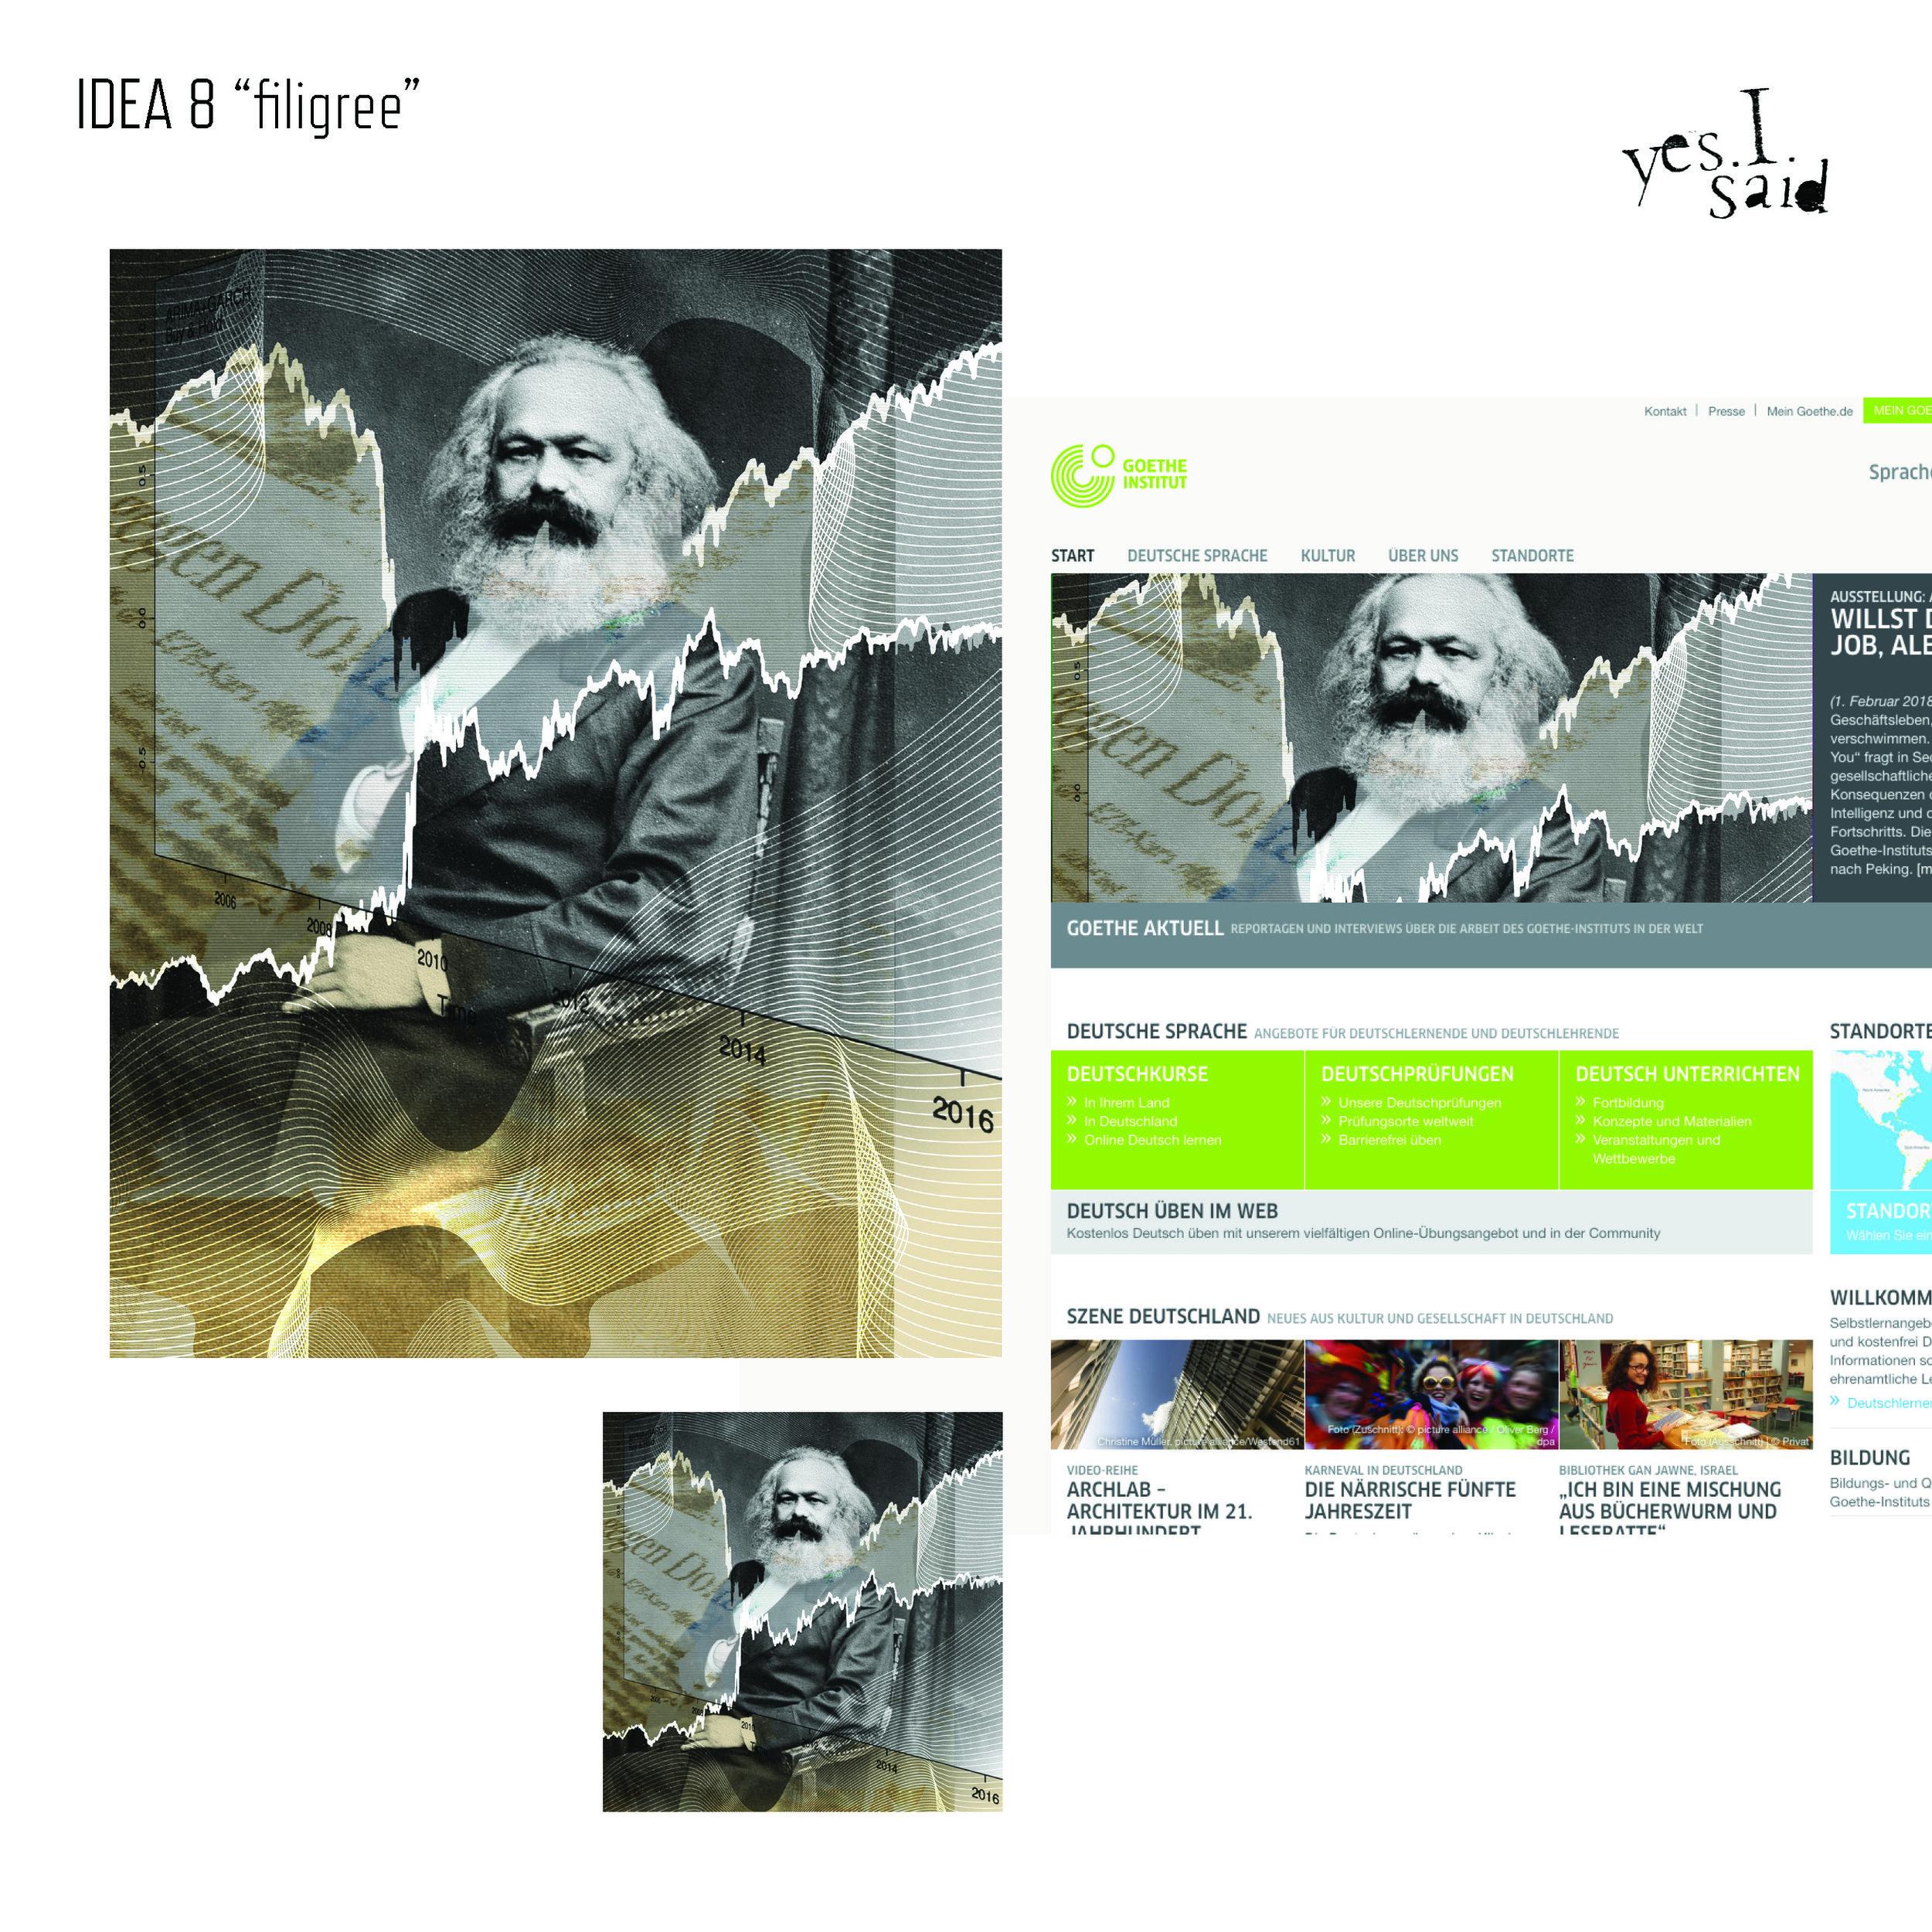 GI-MarxNow_imagemark-secondround__Page_3.jpg